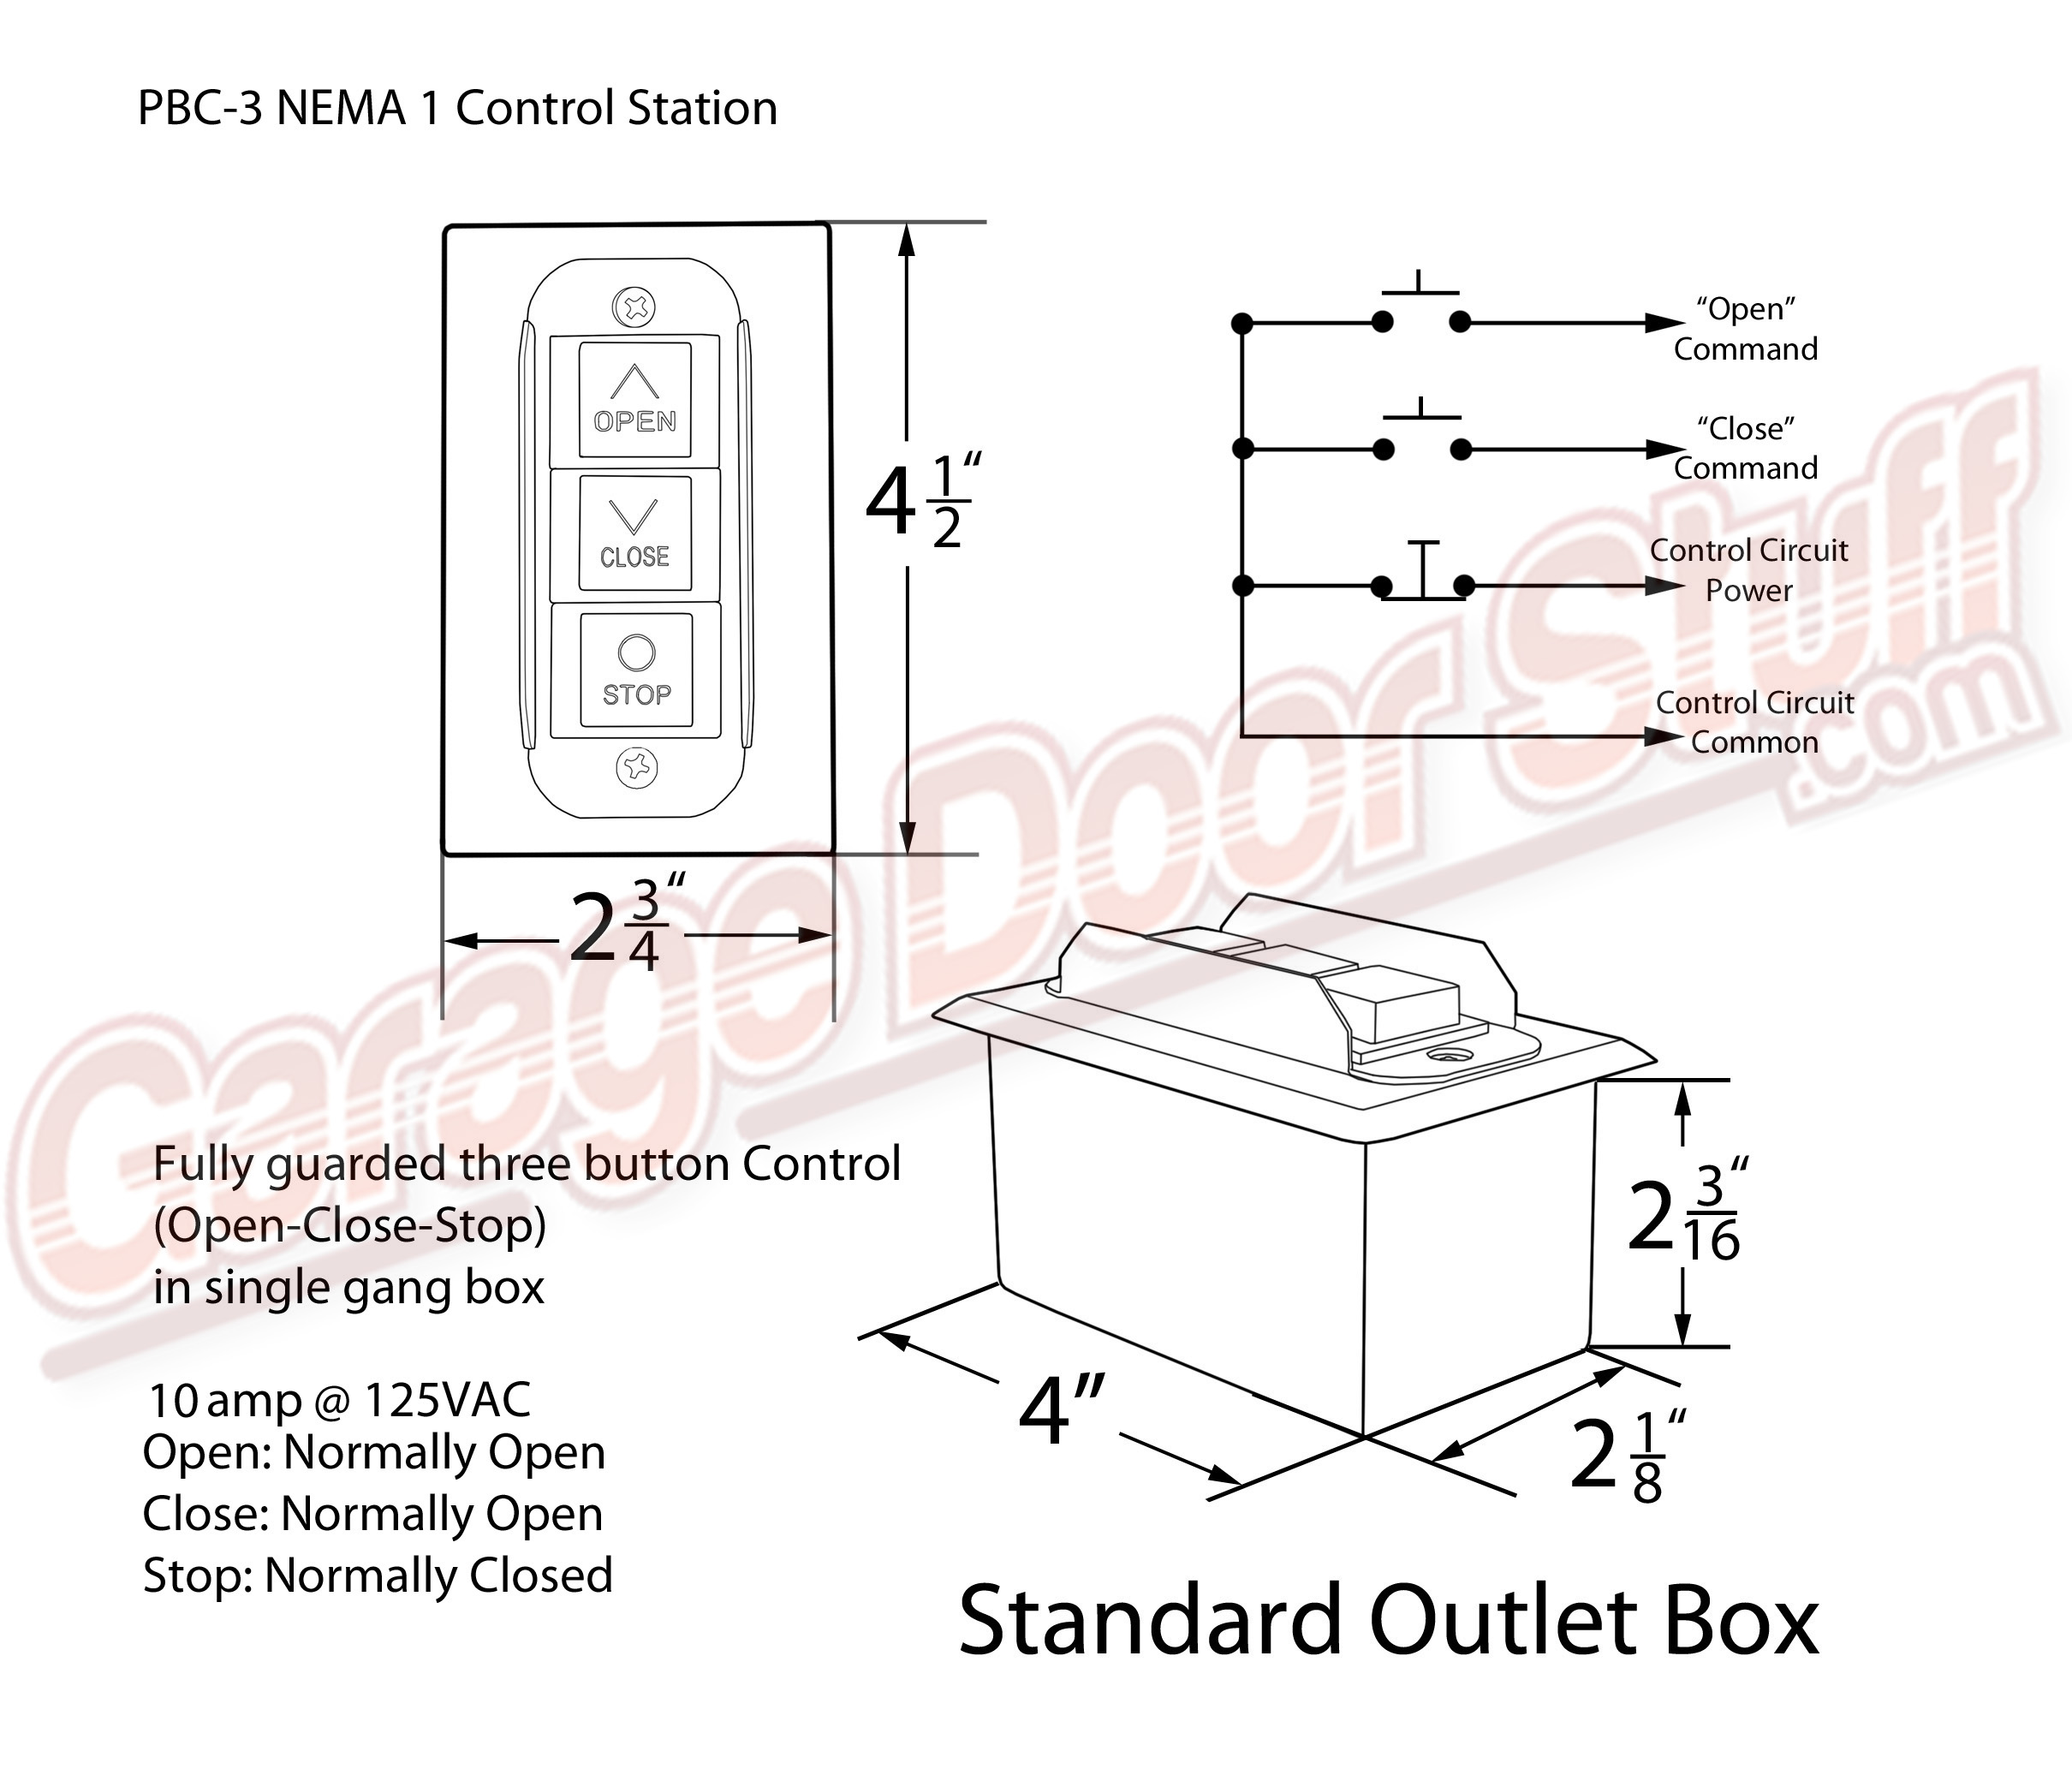 roll up door motor wiring diagram audio 1997 ford explorer neco mk1 23 images